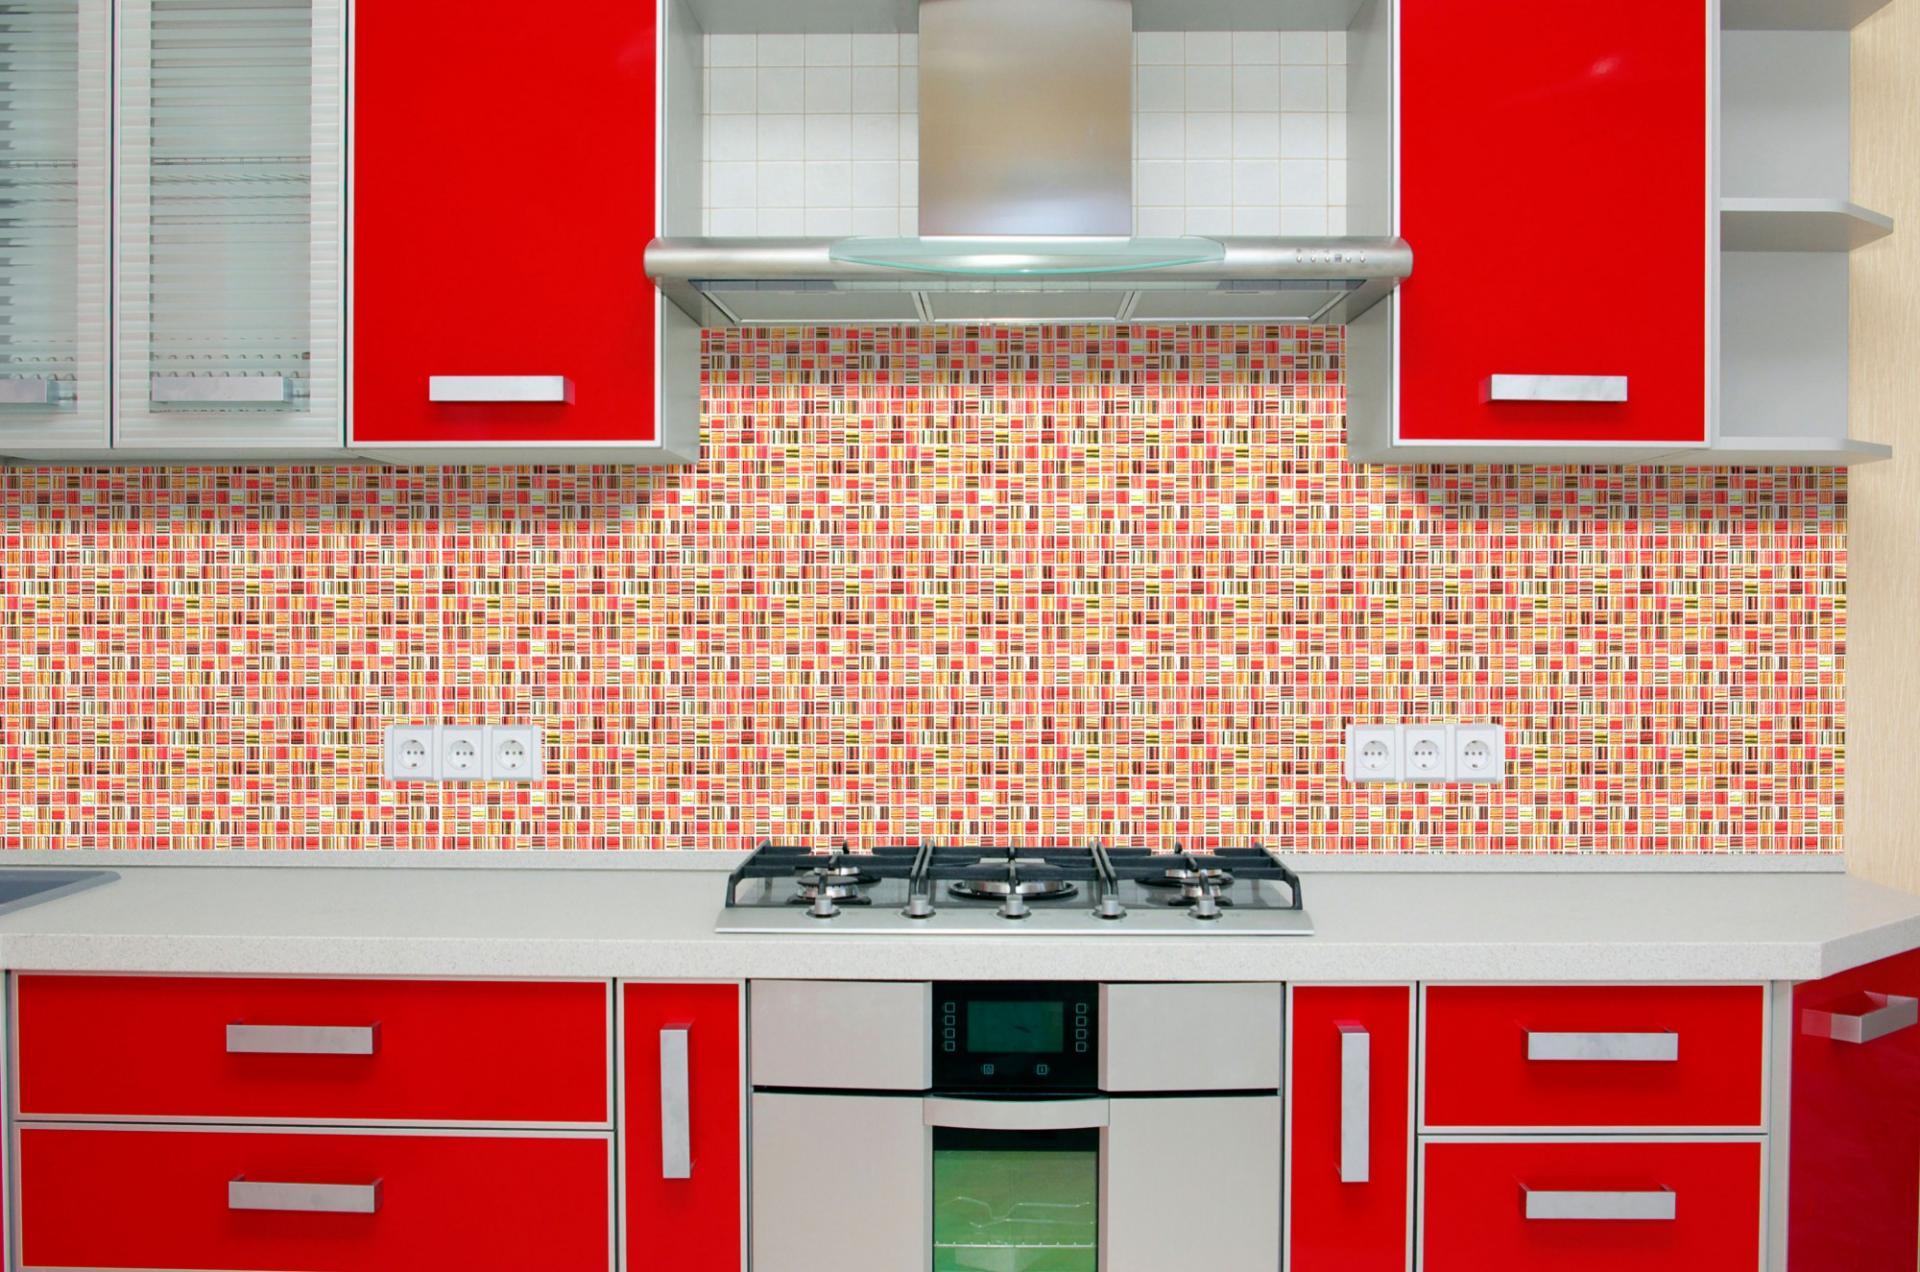 Mosaic caramel 2